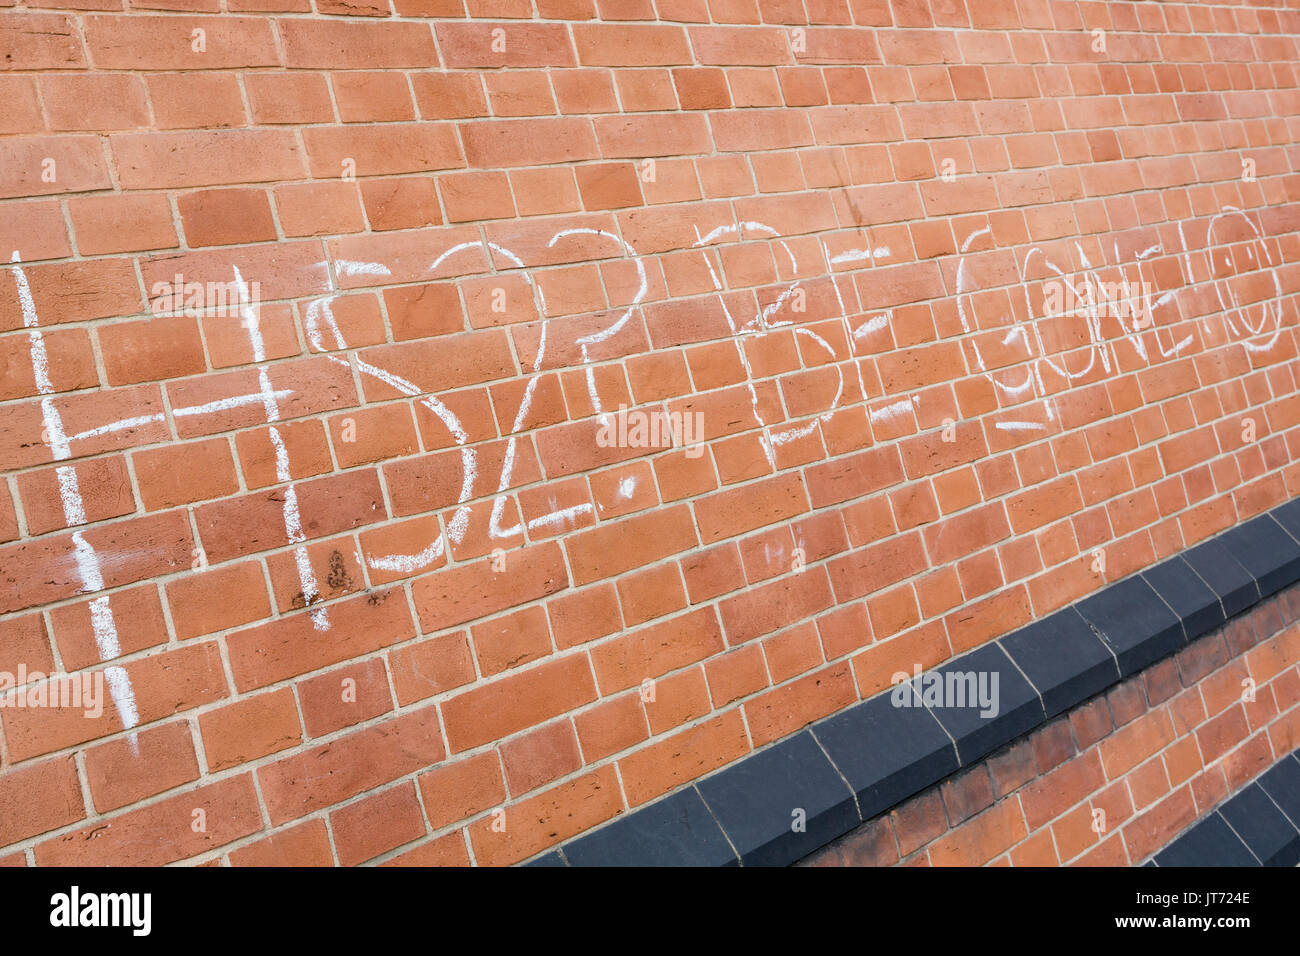 HS2 protest graffiti, King's Cross, London - Stock Image